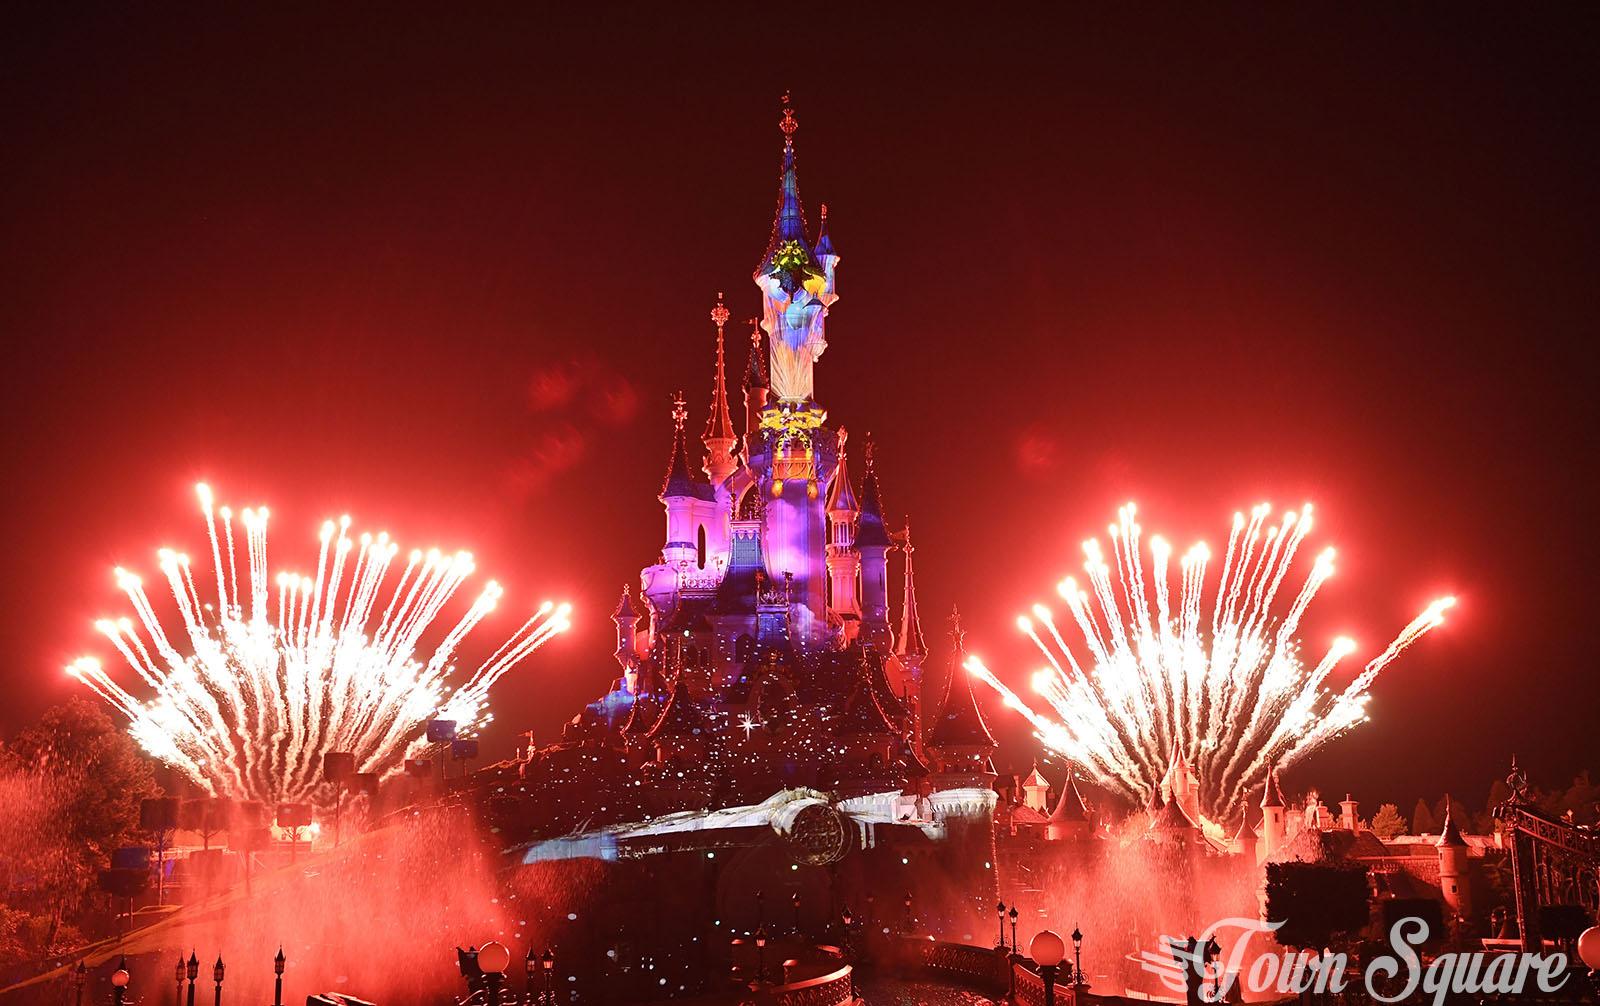 Star Wars in Disney Illuminations